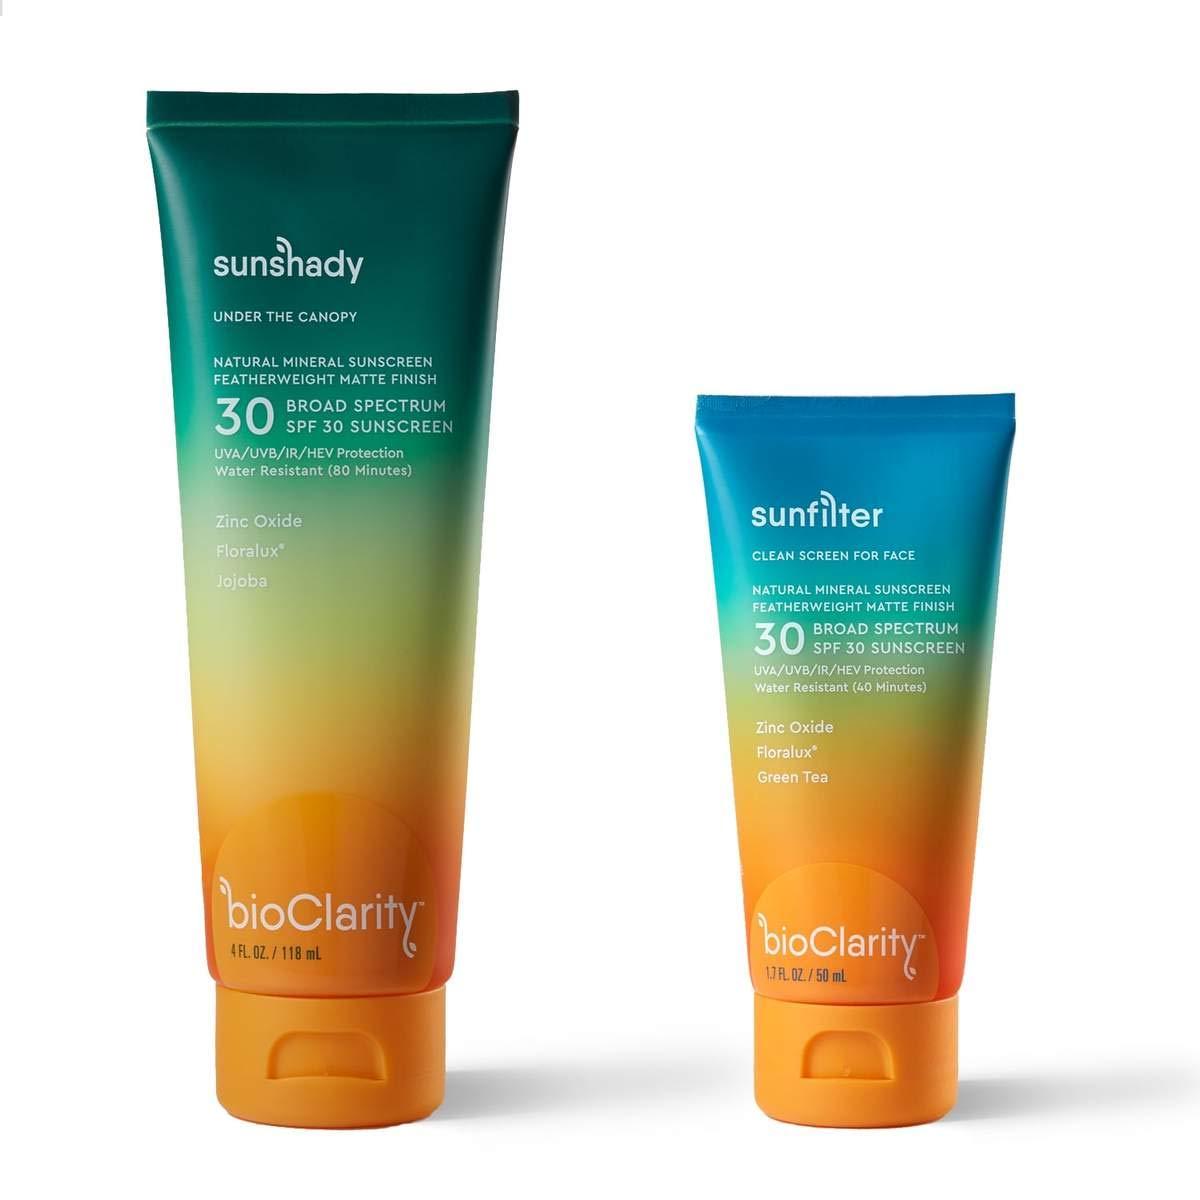 bioClarity Spasm price Defense Duo SPF Max 46% OFF 30 Sunscreen Face Loti Body Mineral